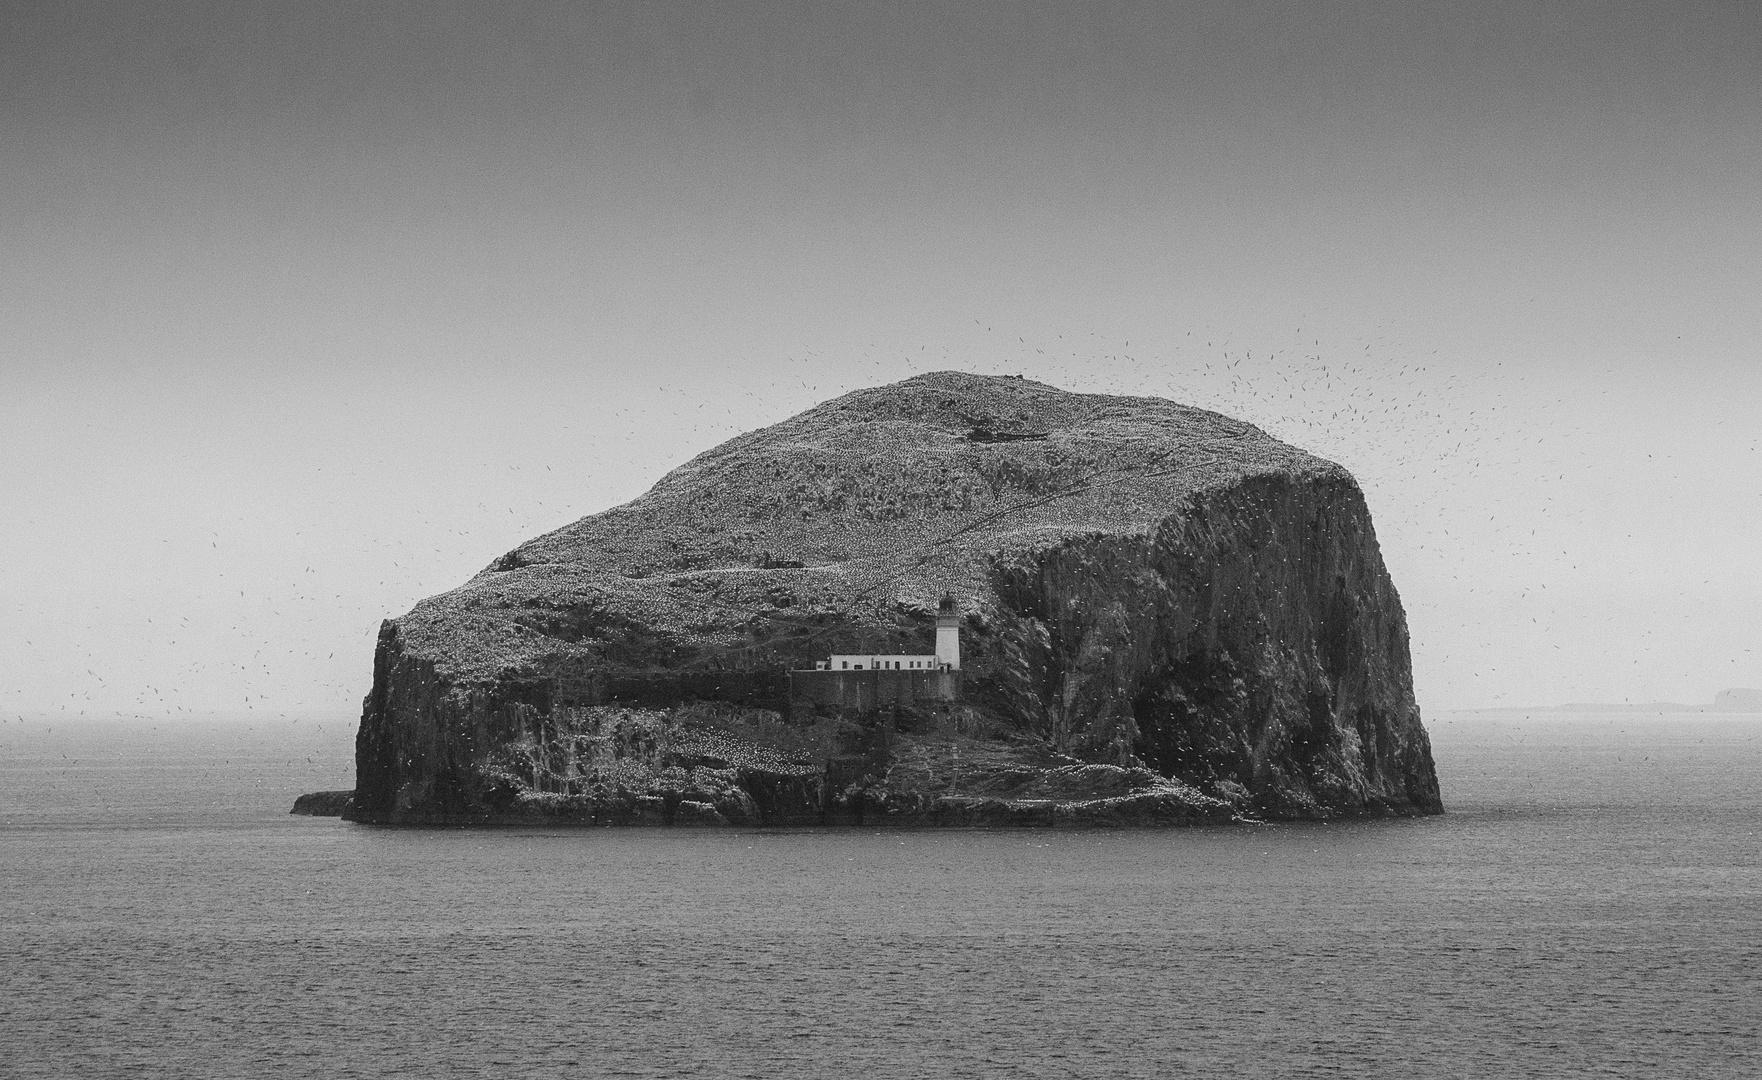 Bass Rock in North Berwick